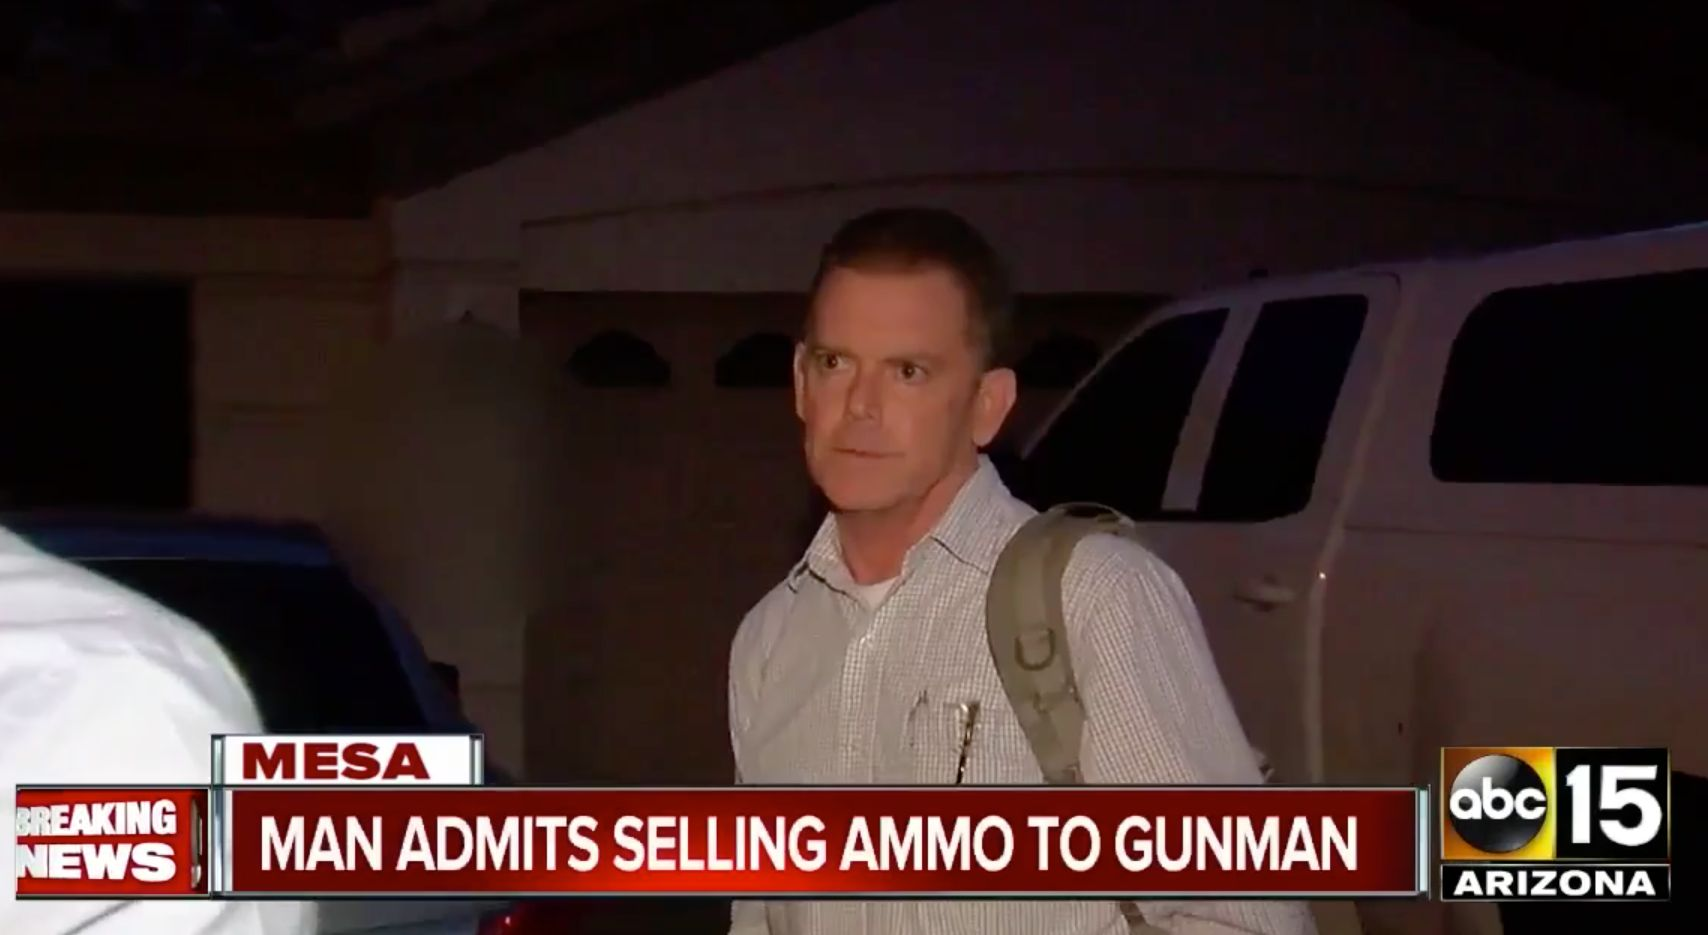 Arizona man confirms selling ammo to Las Vegas shooter